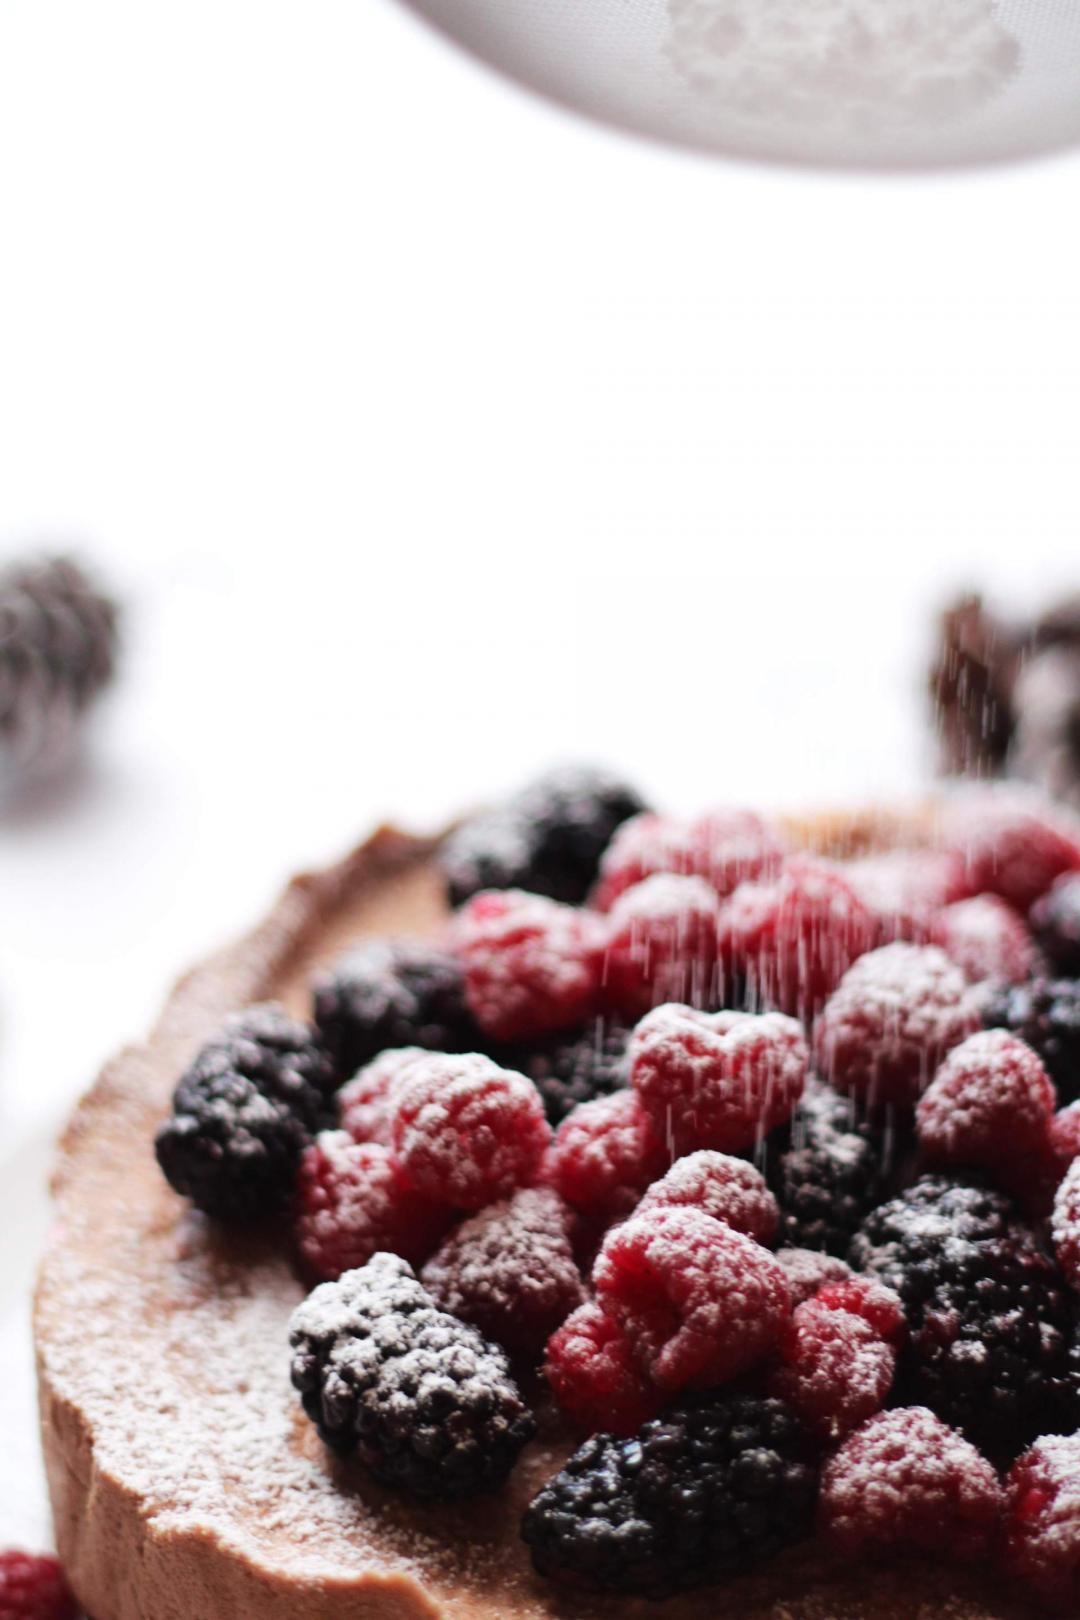 lindt-chocolate-mousse-cake-alternative-christmas-cake-easy-recipe-1